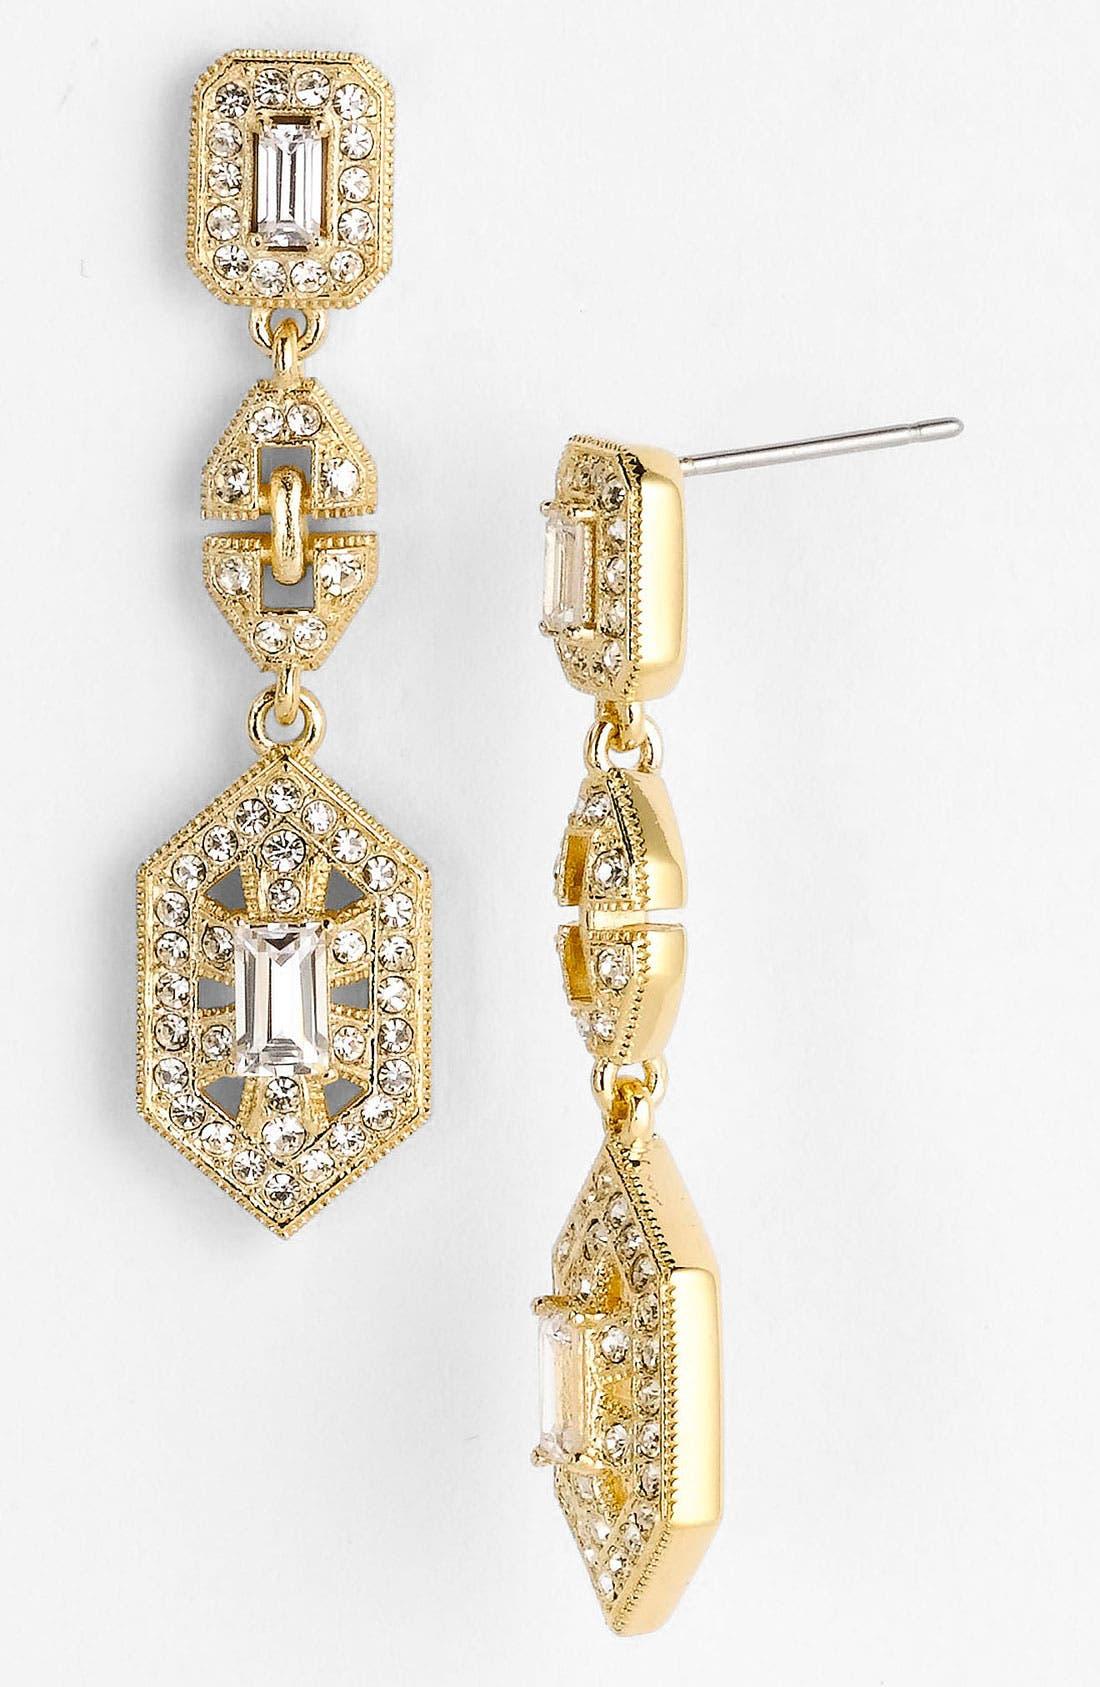 Alternate Image 1 Selected - Nadri 'Art Deco' Linear Earrings (Nordstrom Exclusive)